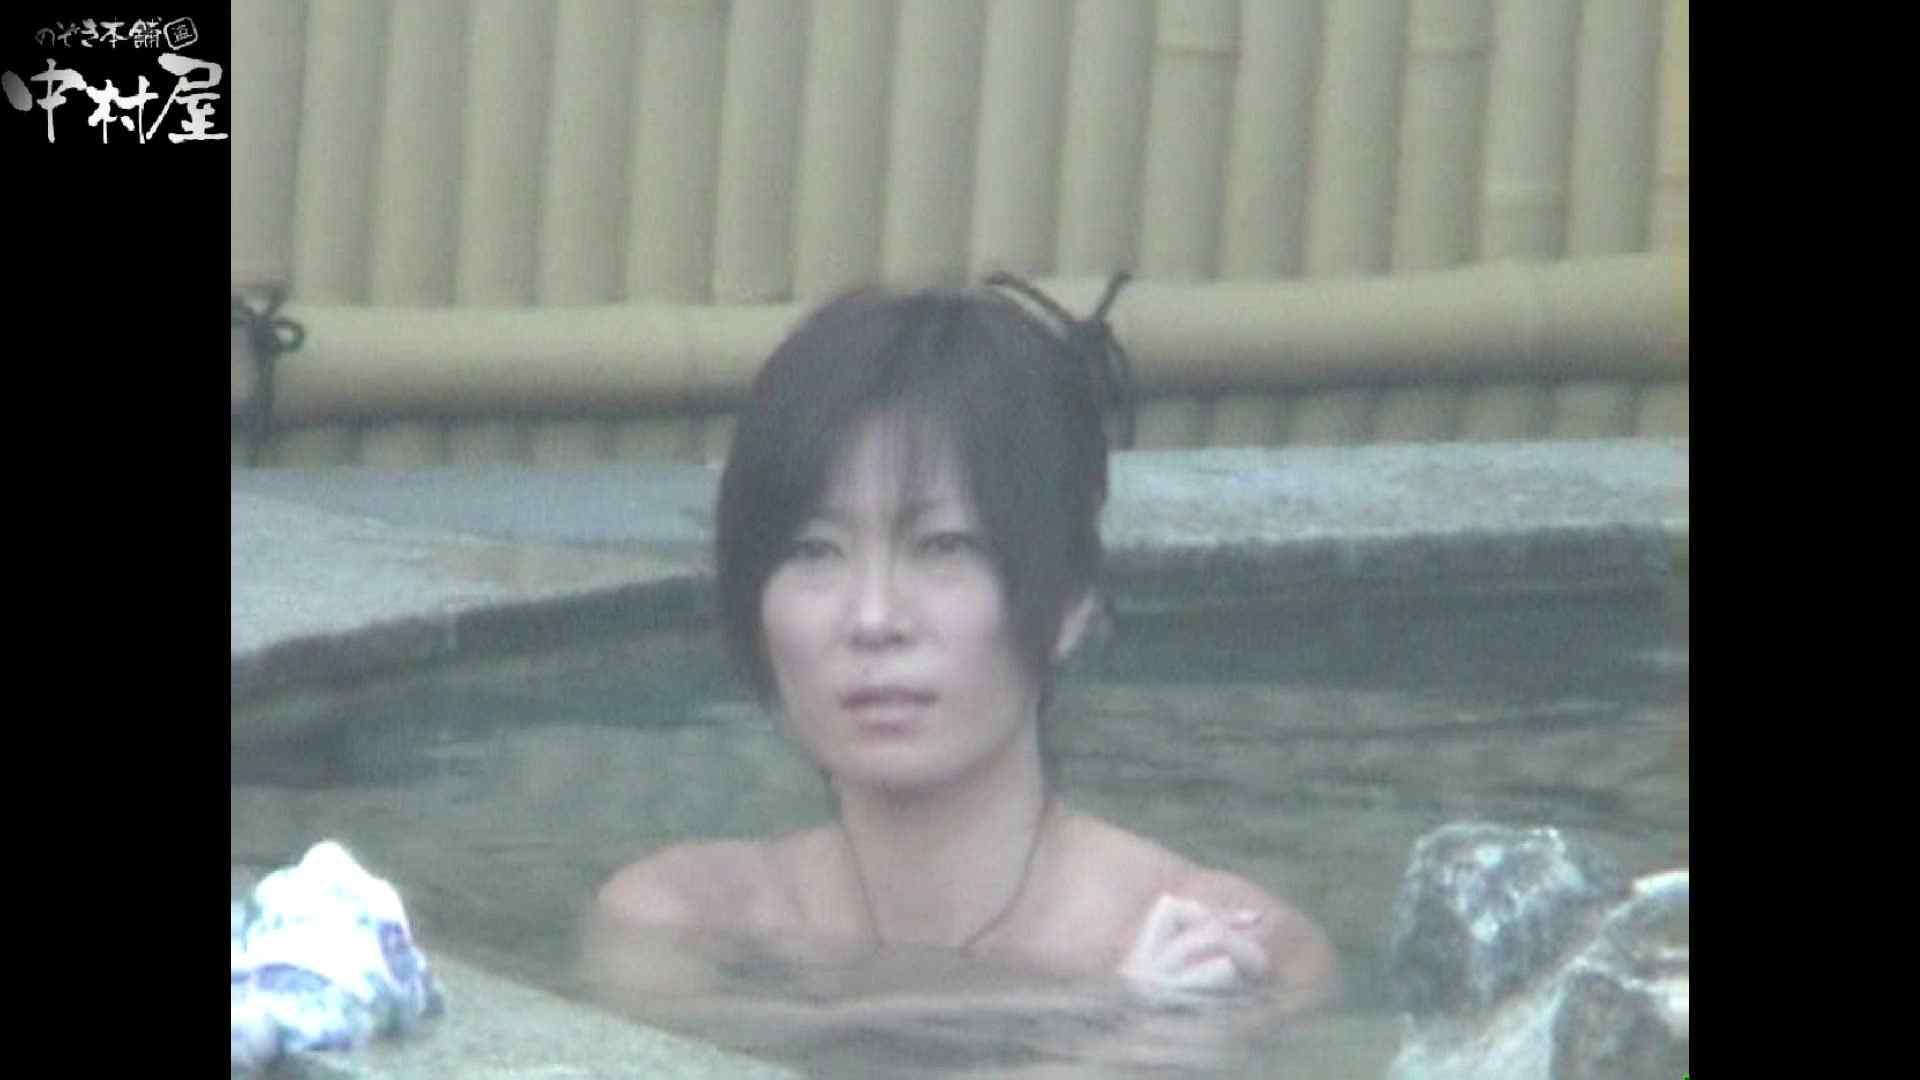 Aquaな露天風呂Vol.972 露天   OLセックス  80画像 61